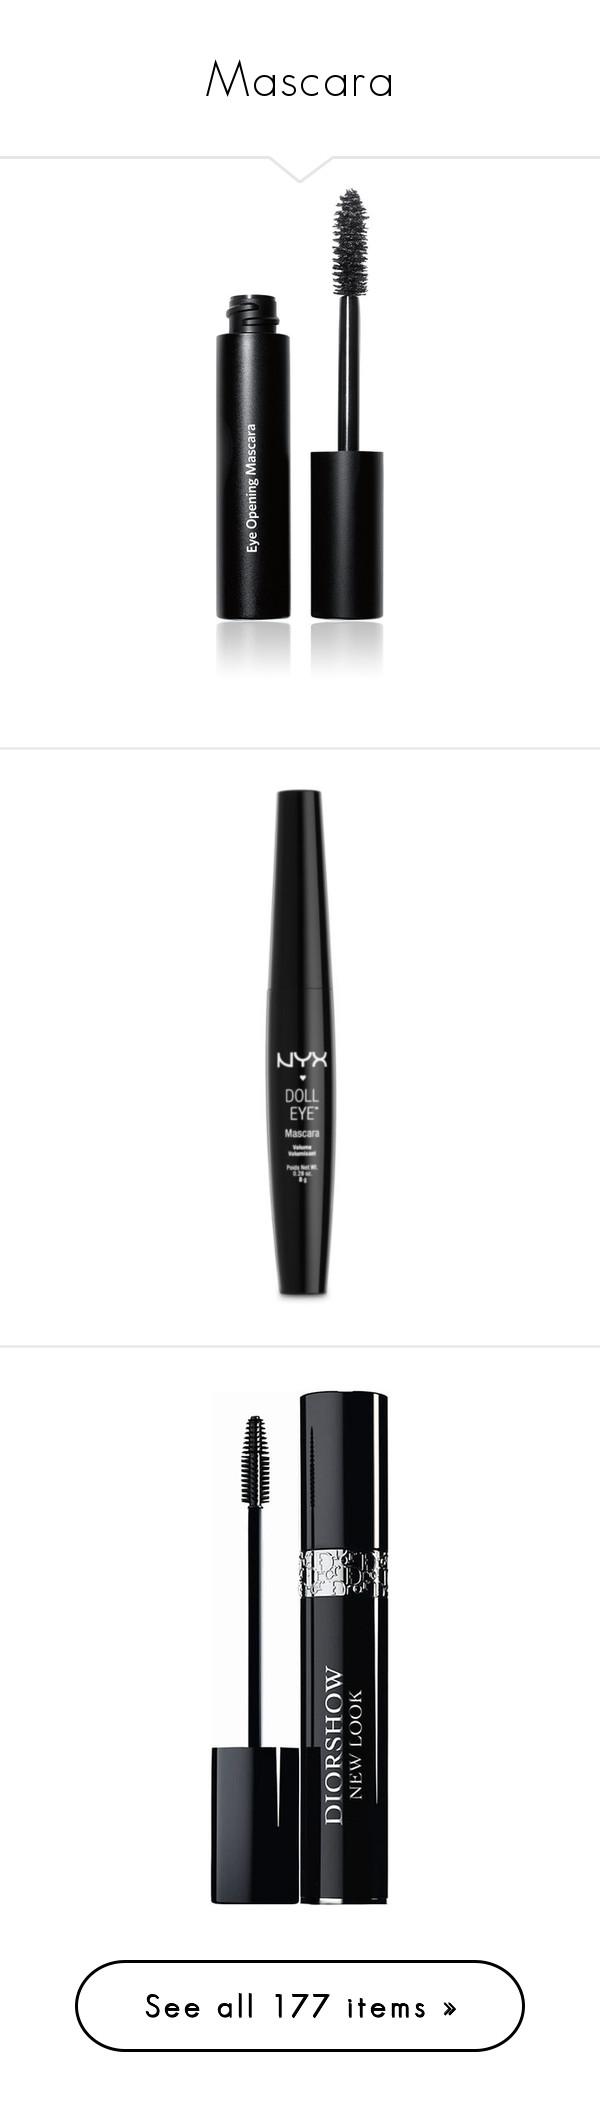 """Mascara"" by tina-teena ❤ liked on Polyvore featuring beauty products, makeup, eye makeup, mascara, beauty, cosmetics, eyes, filler, bobbi brown cosmetics and thickening mascara"